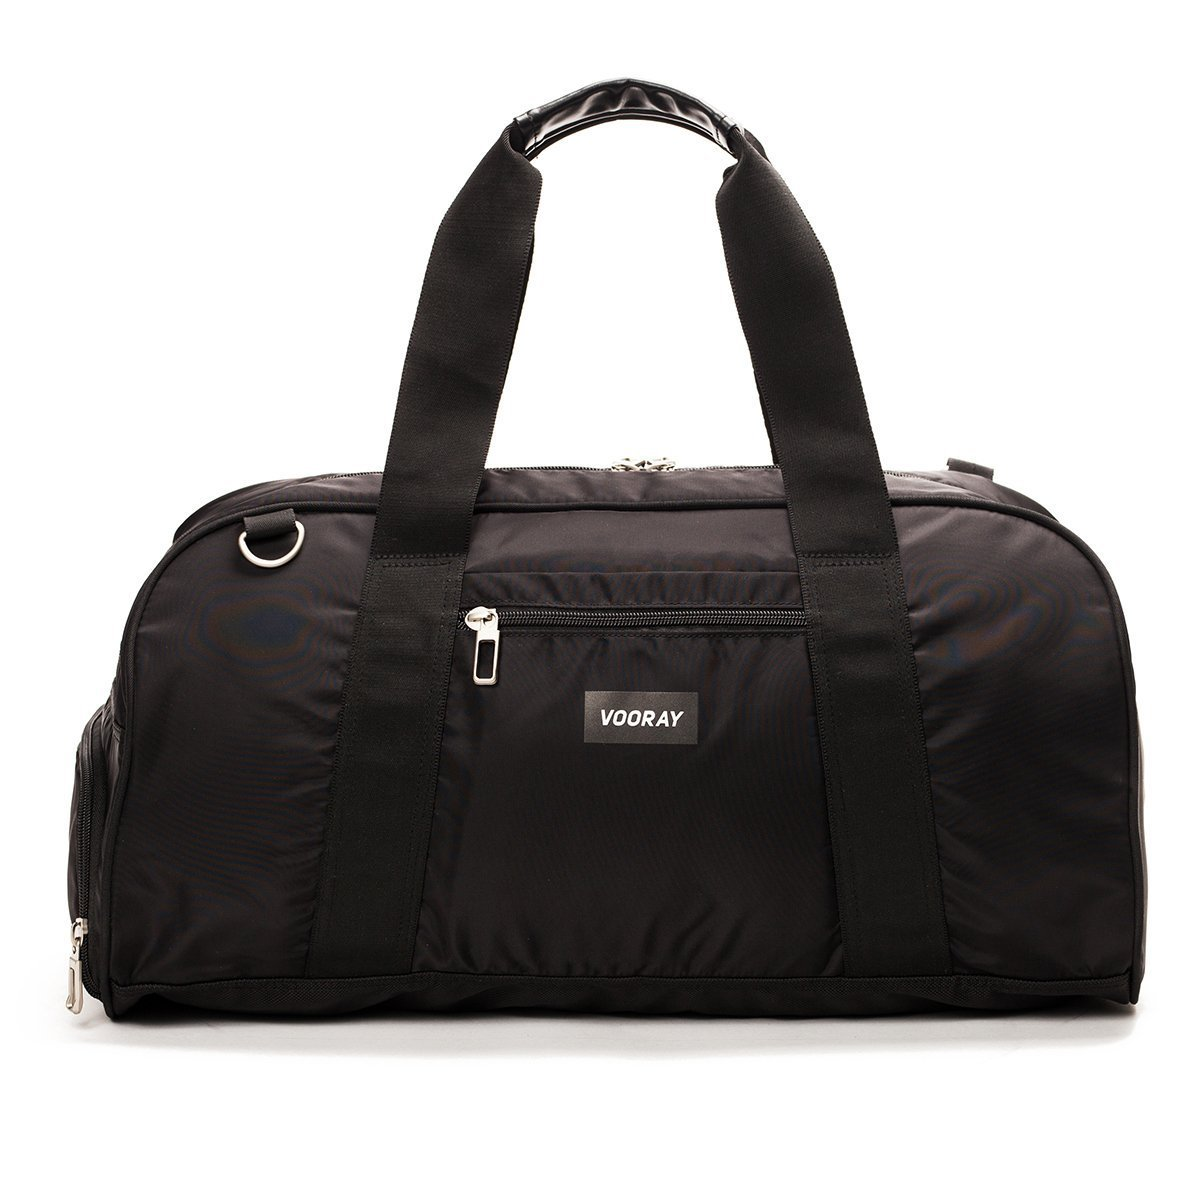 Vooray: Burner Sport Duffel Large - Black Nylon image